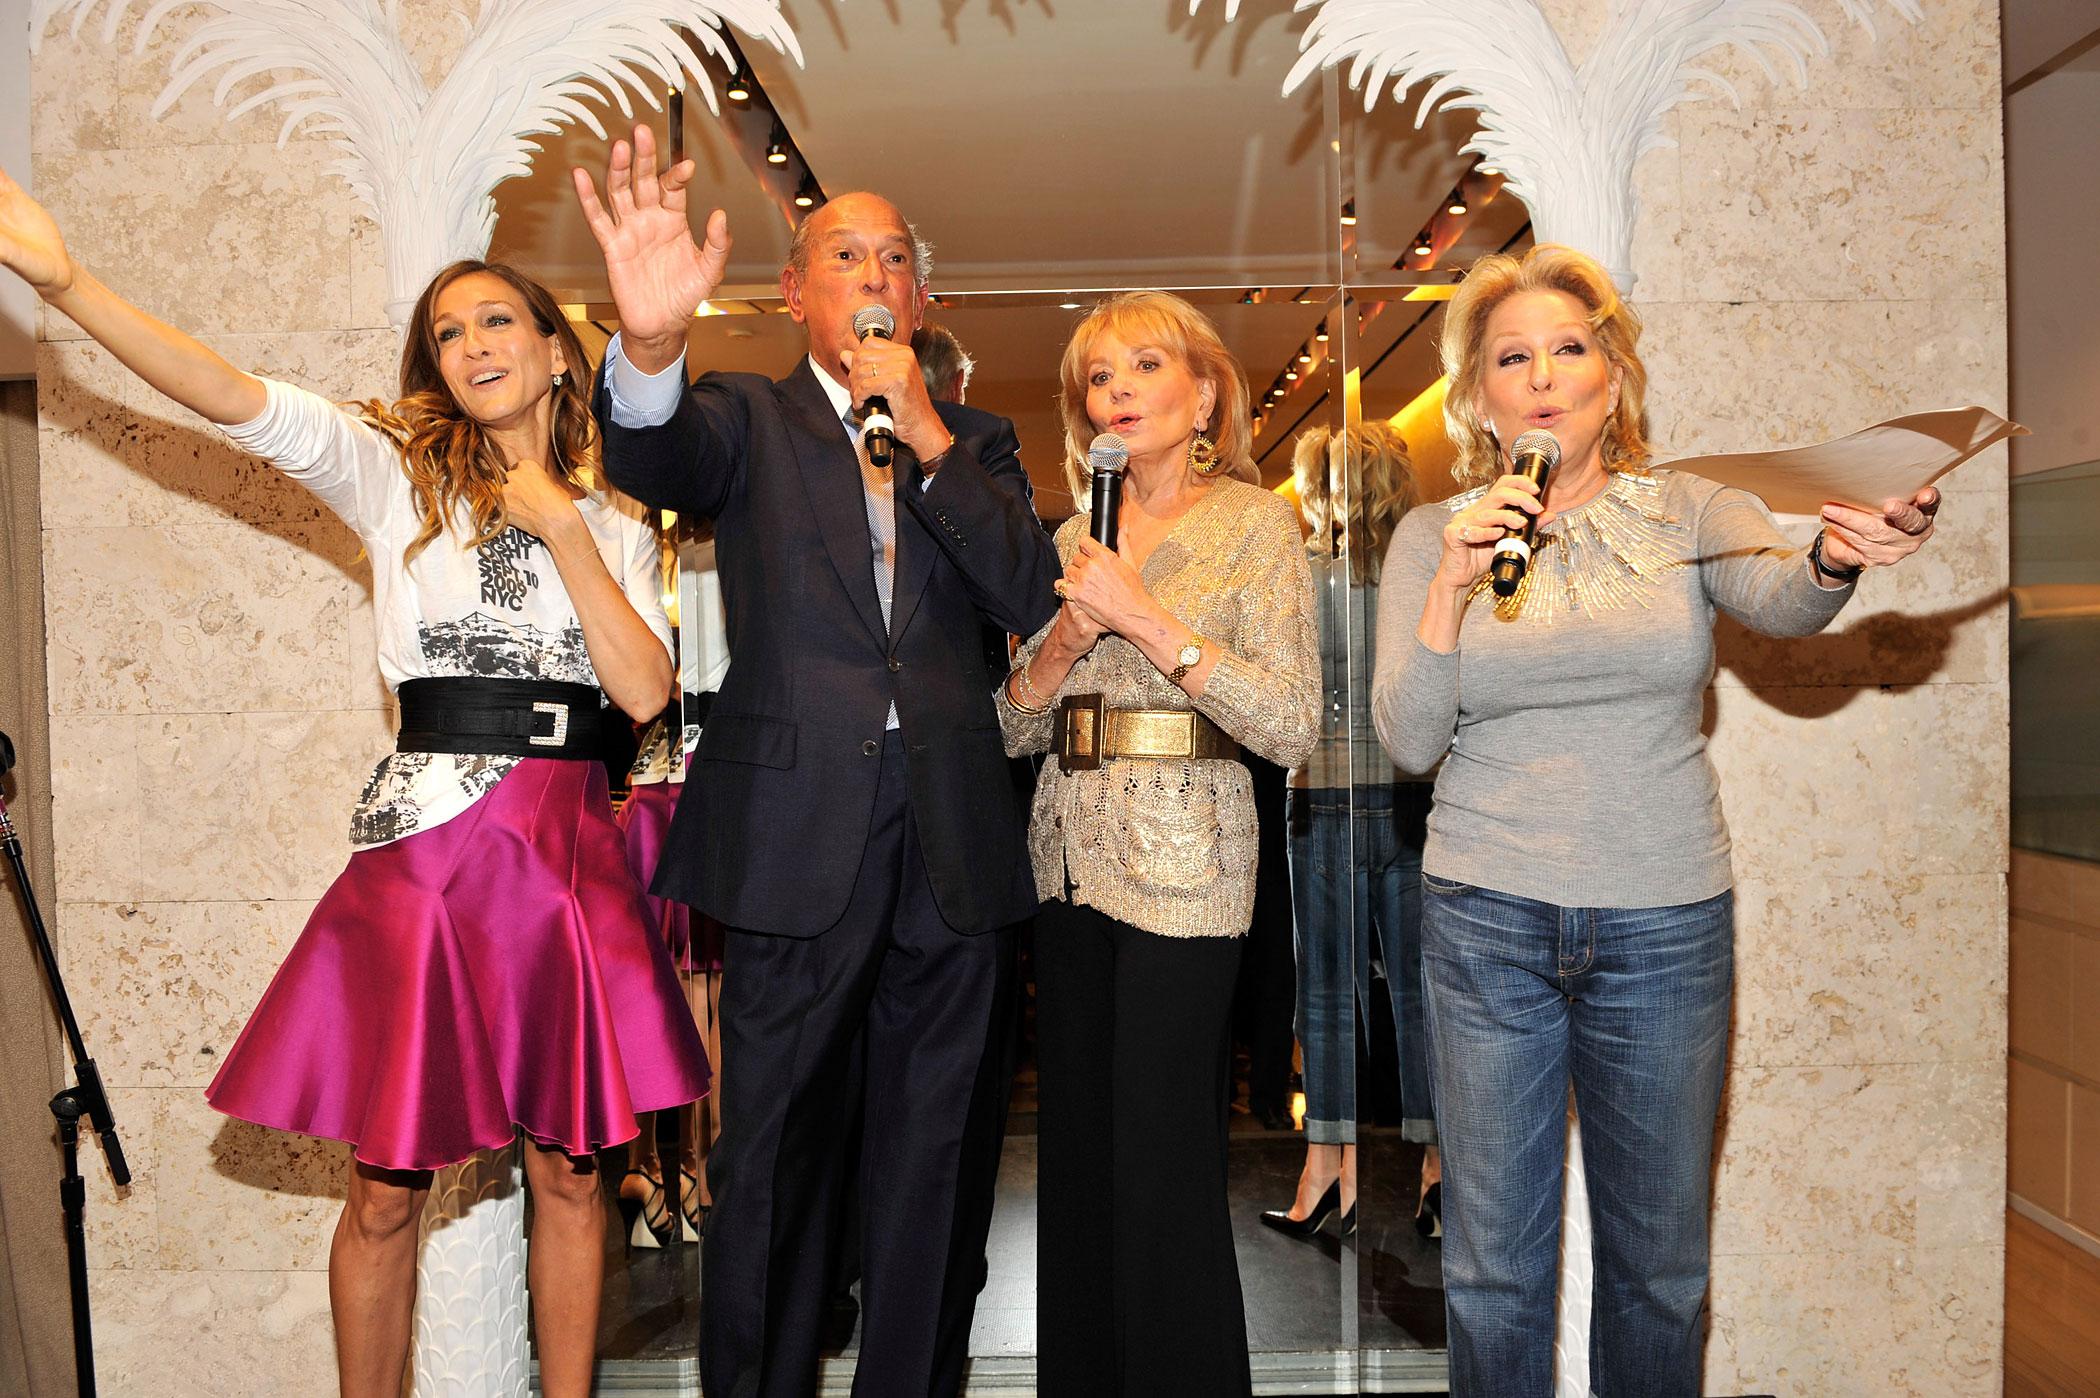 Sarah Jessica Parker, Barbara Walters, Oscar de la Renta and Bette Midler attend the Oscar de la Renta Fashion's Night Out party at the Oscar de la Renta Boutique on September 10, 2009 in New York City.